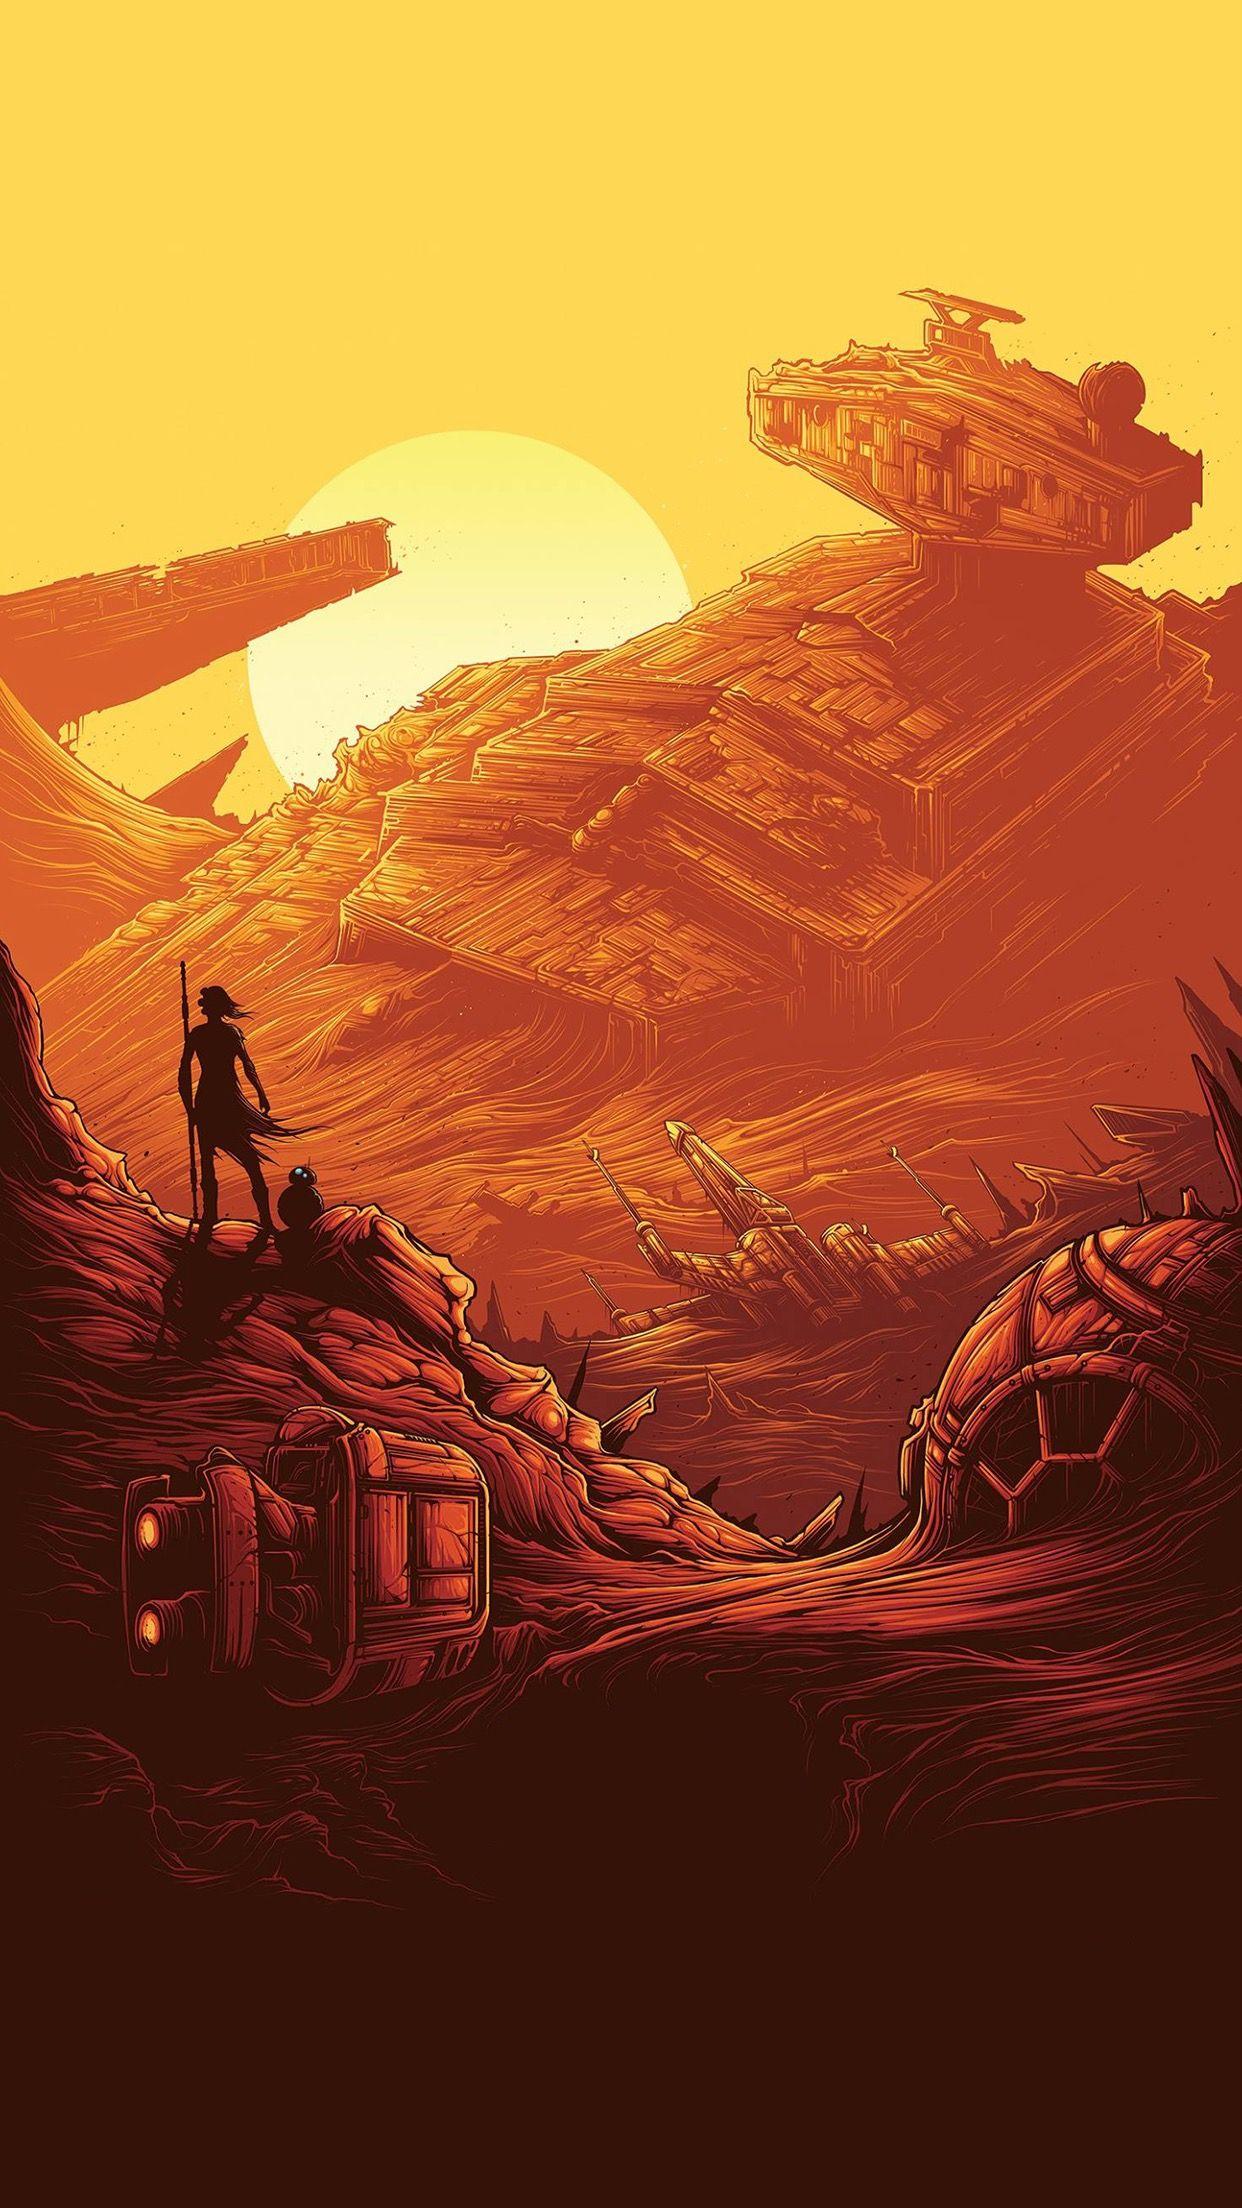 Star Wars Ipod Wallpapers On Wallpaperdog